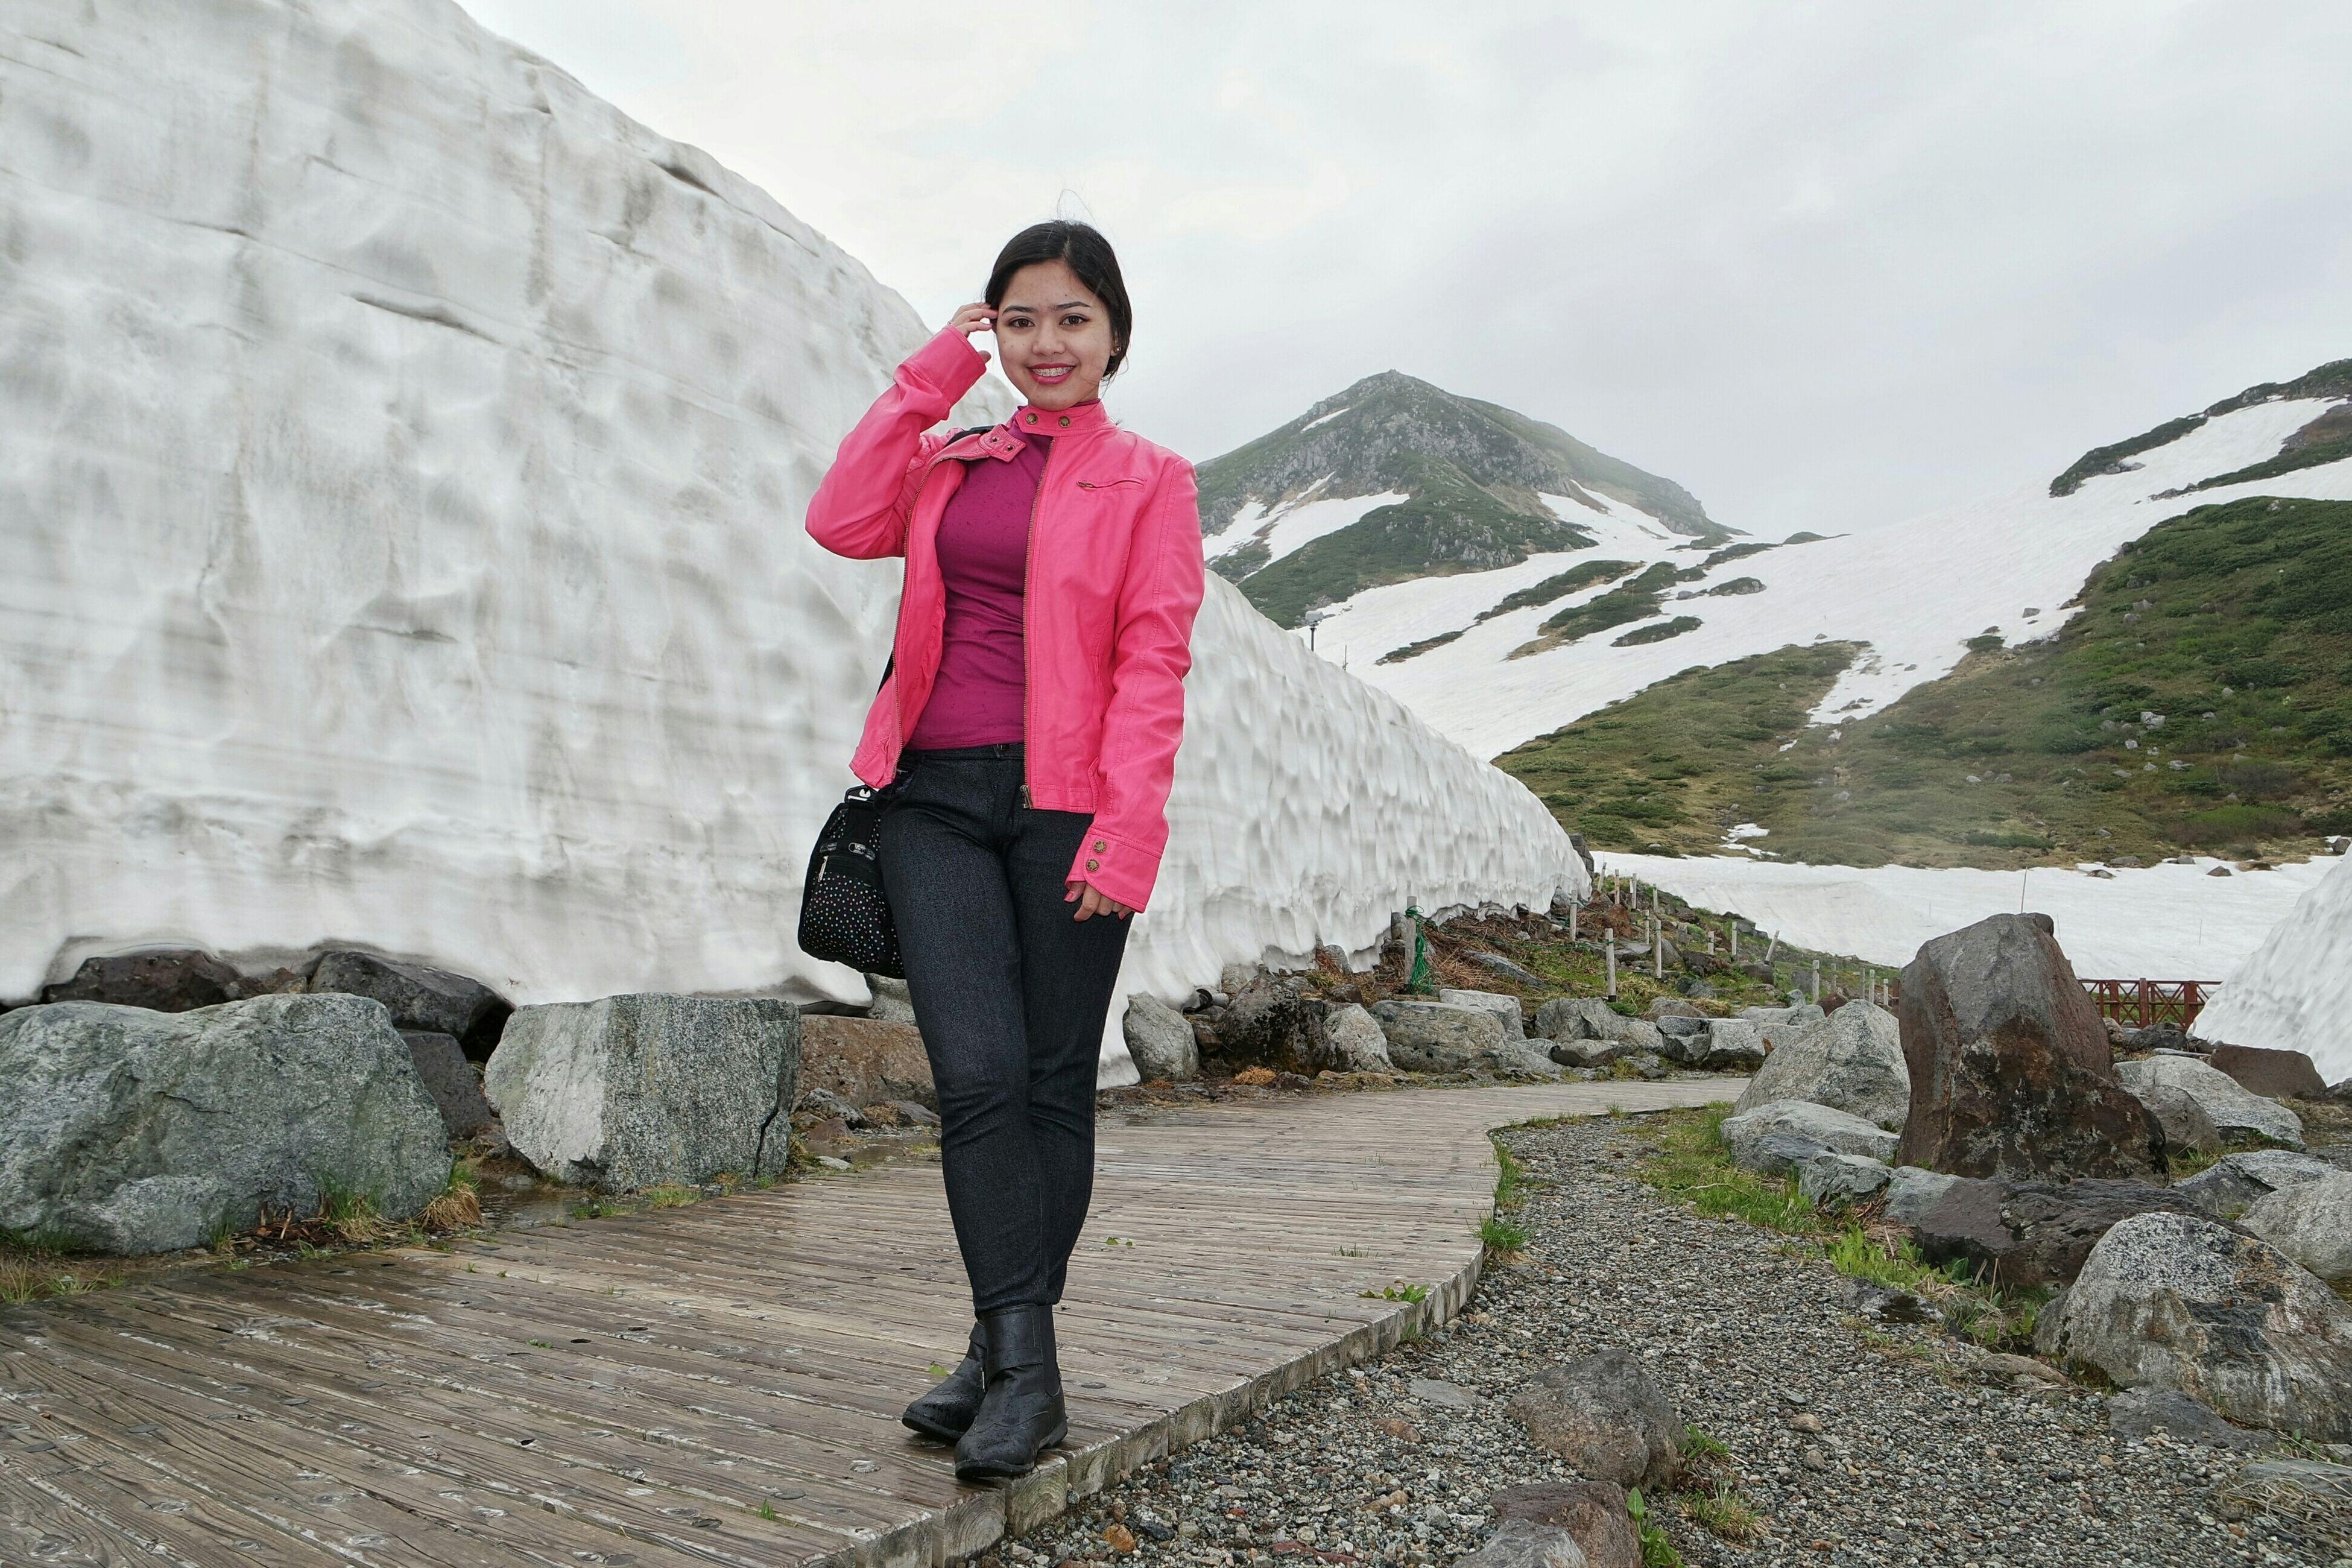 Tateyama Snow Wall 😊😄😁 Tateyama Alpine Route Toyama, Japan Snow Miss Pink Filipina Eyeem Pinay The Traveler - 2015 EyeEm Awards Travel